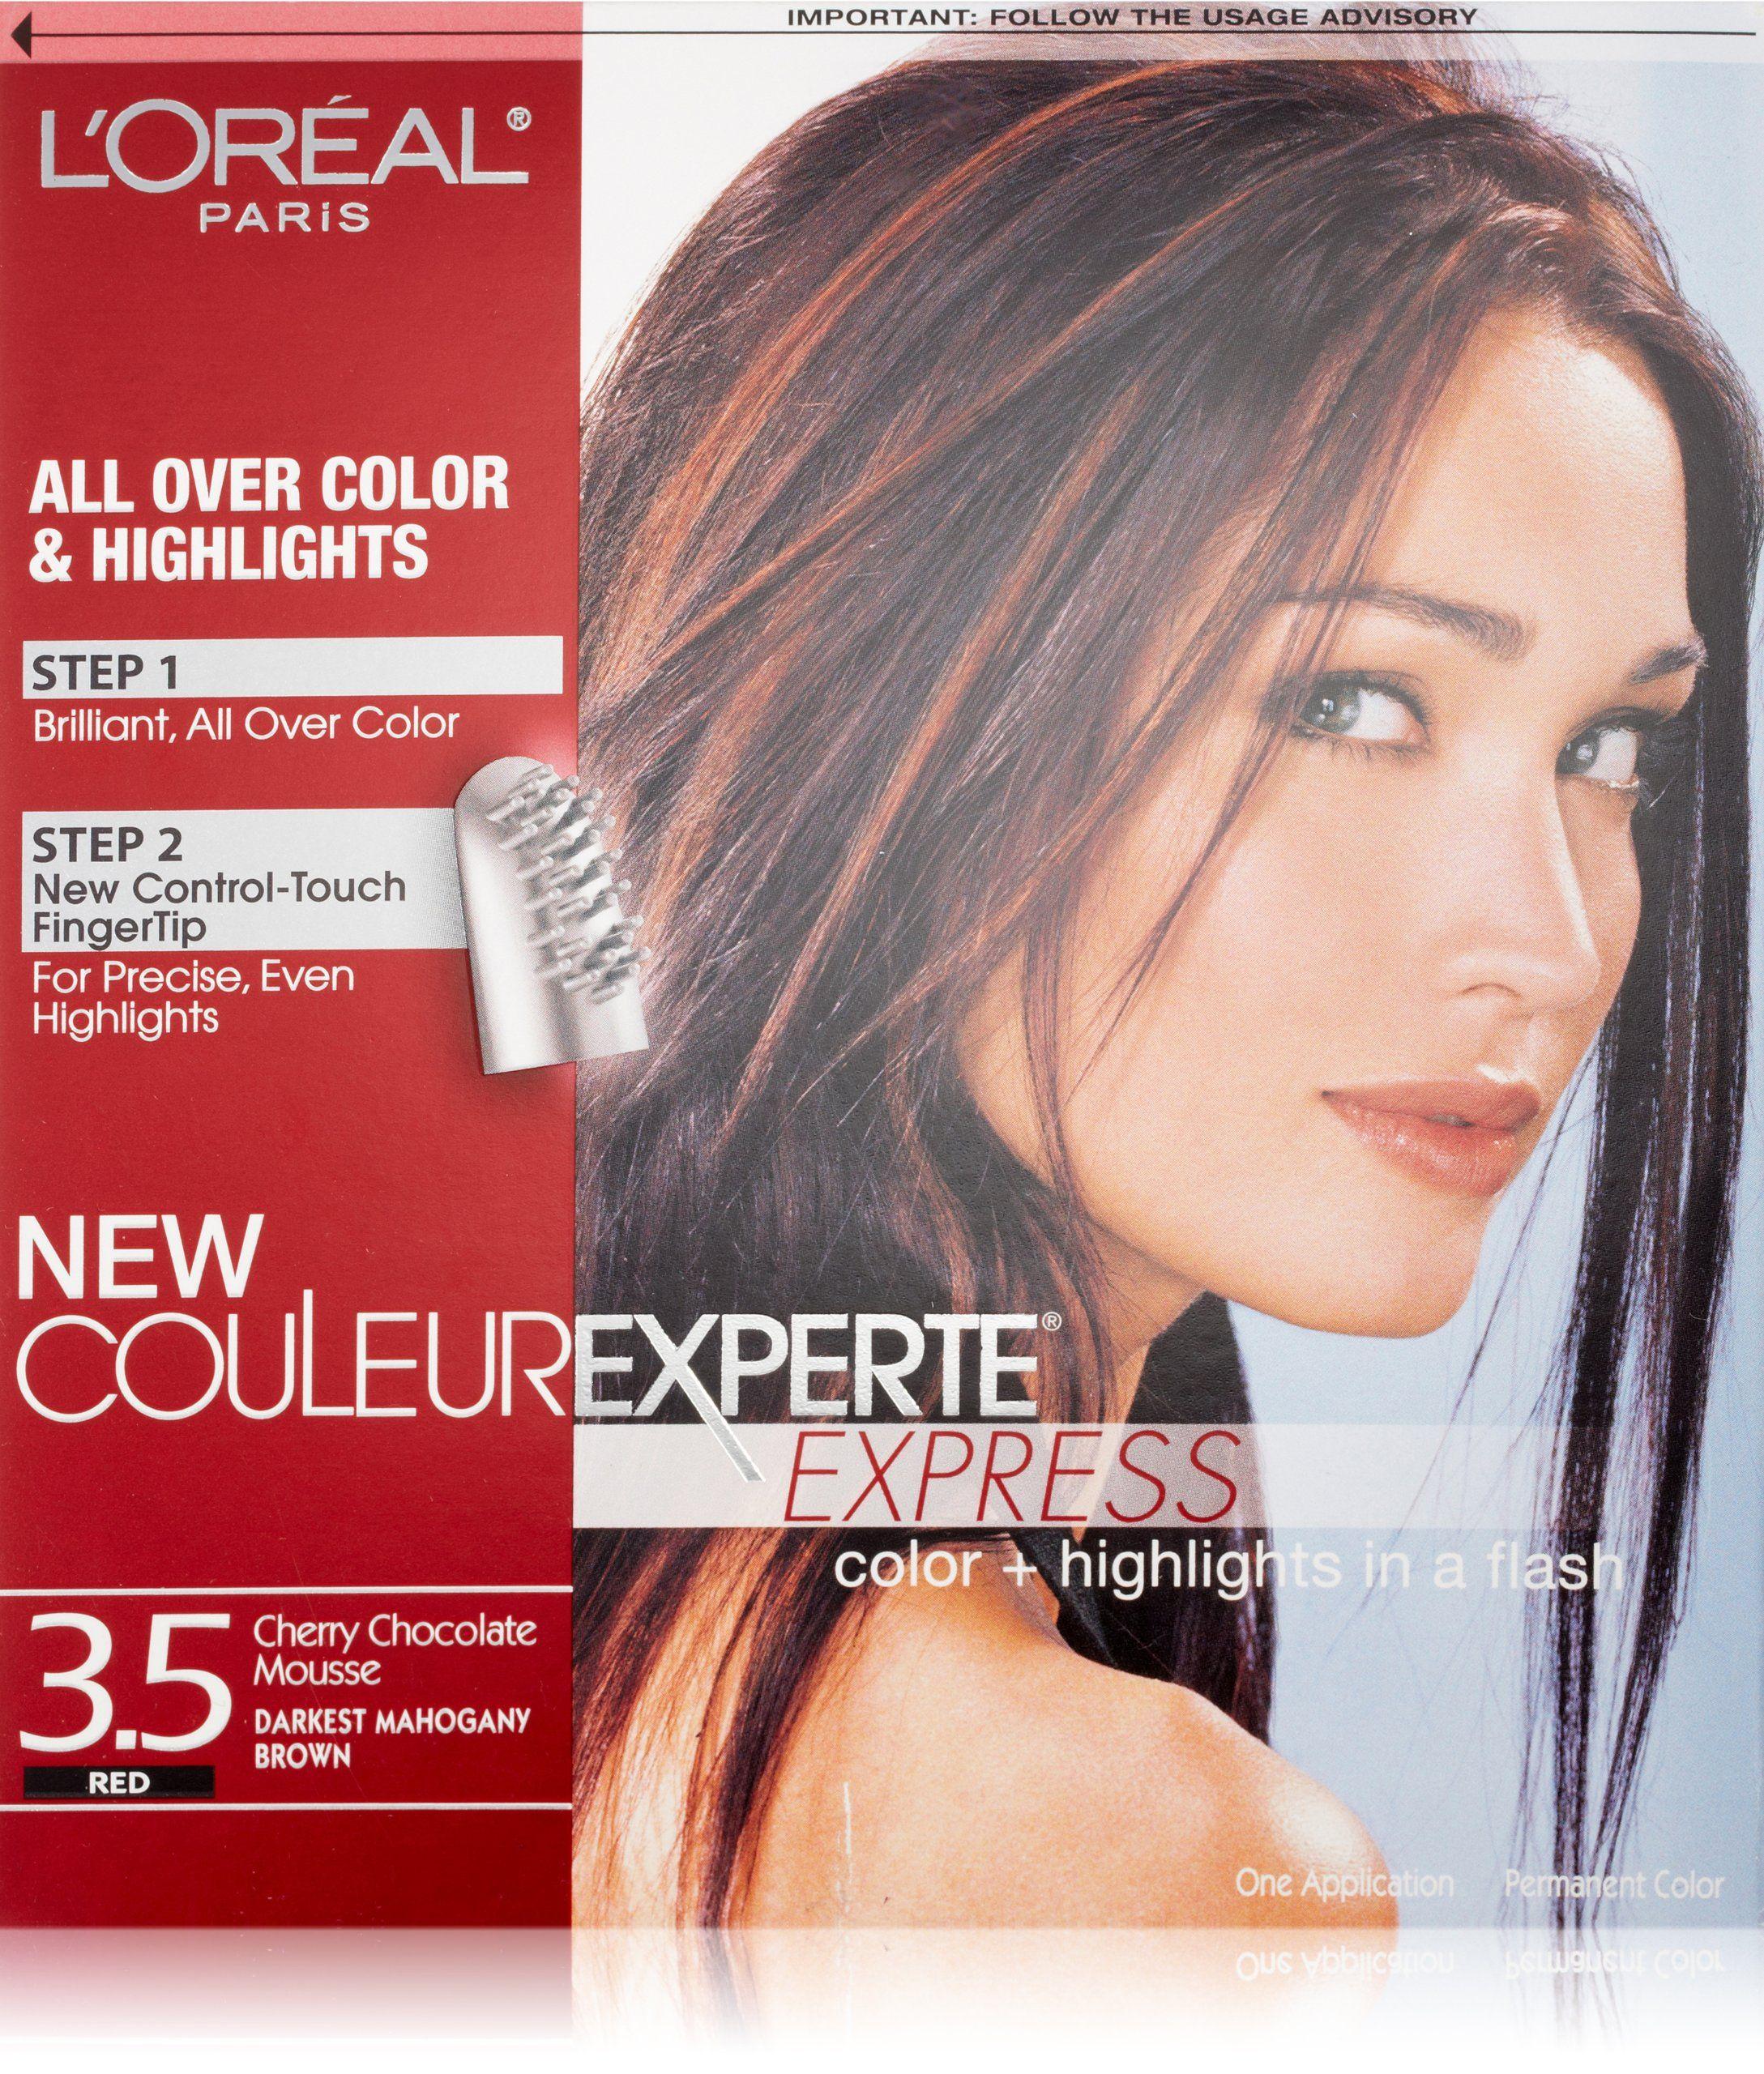 Loreal Paris Couleur Experte Color Highlights In A Flash Darkest